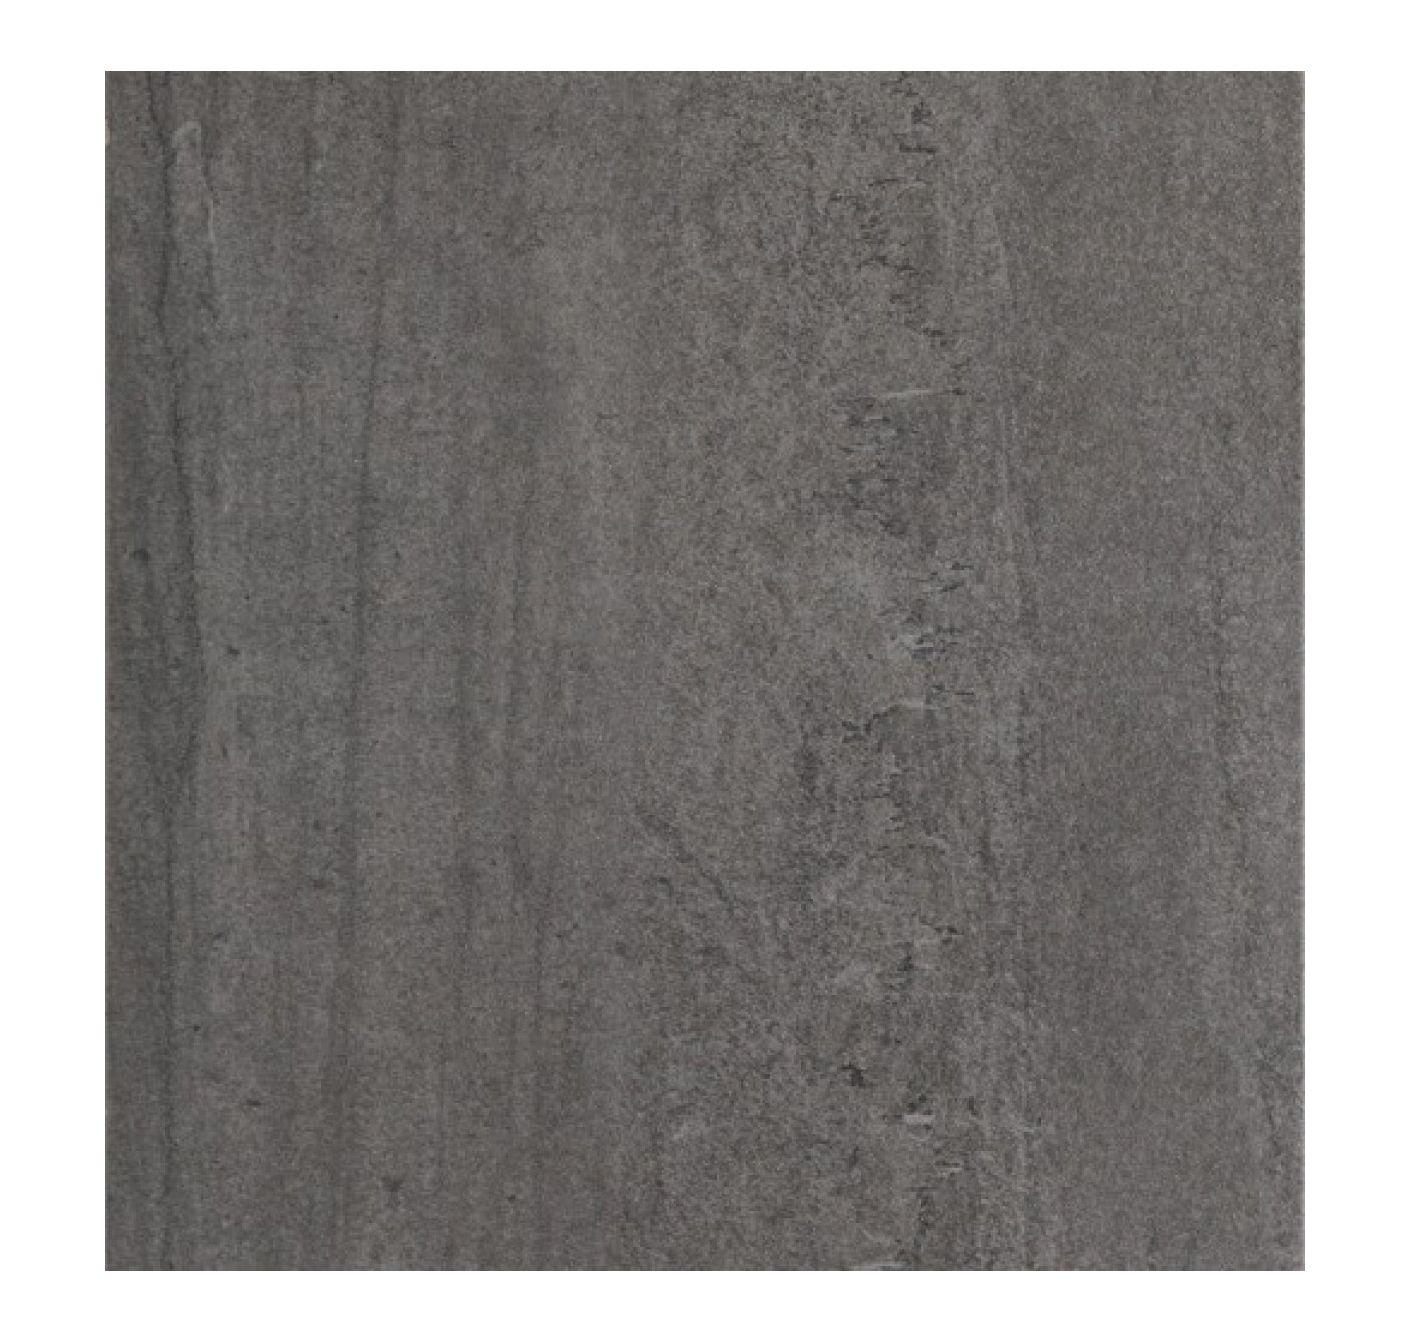 Antraciet Grijs Tegels.Keramische Tuintegel 60 X 60 Cm Quarzite Antraciet Dikte 4 Cm Per Tegel